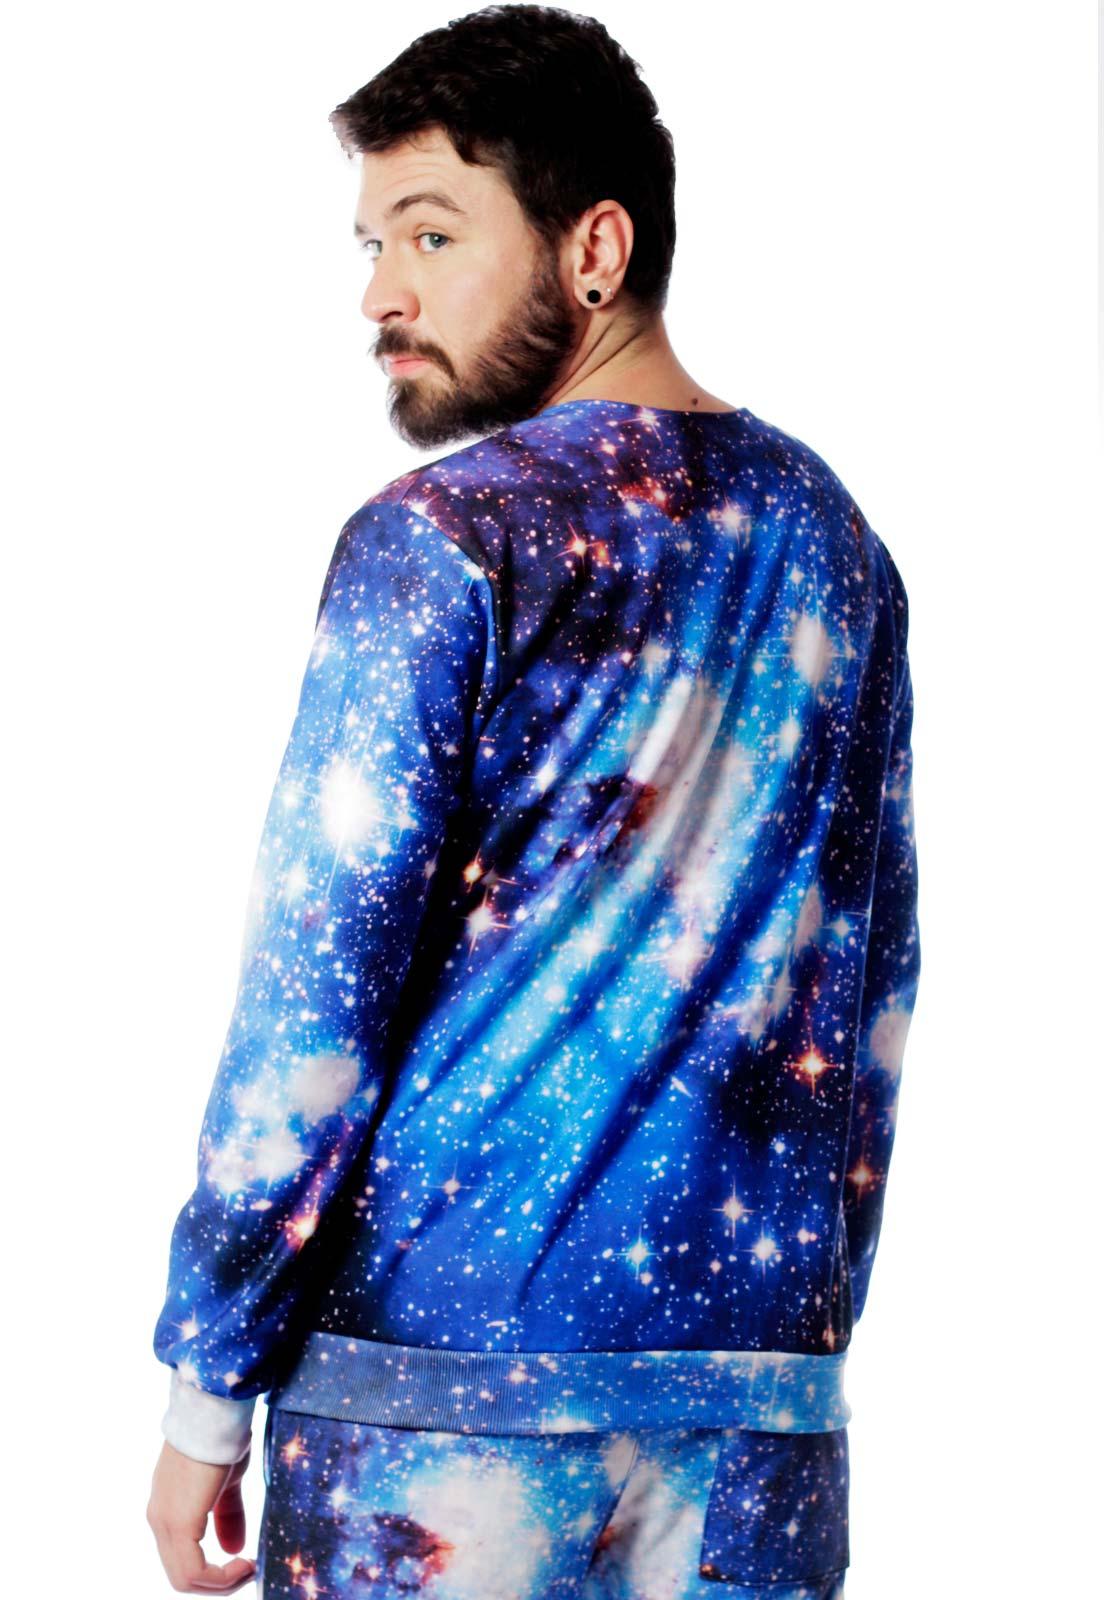 Blusa Moletom Galaxy Estampado Full Print Unissex Universo Roupas Tumblr